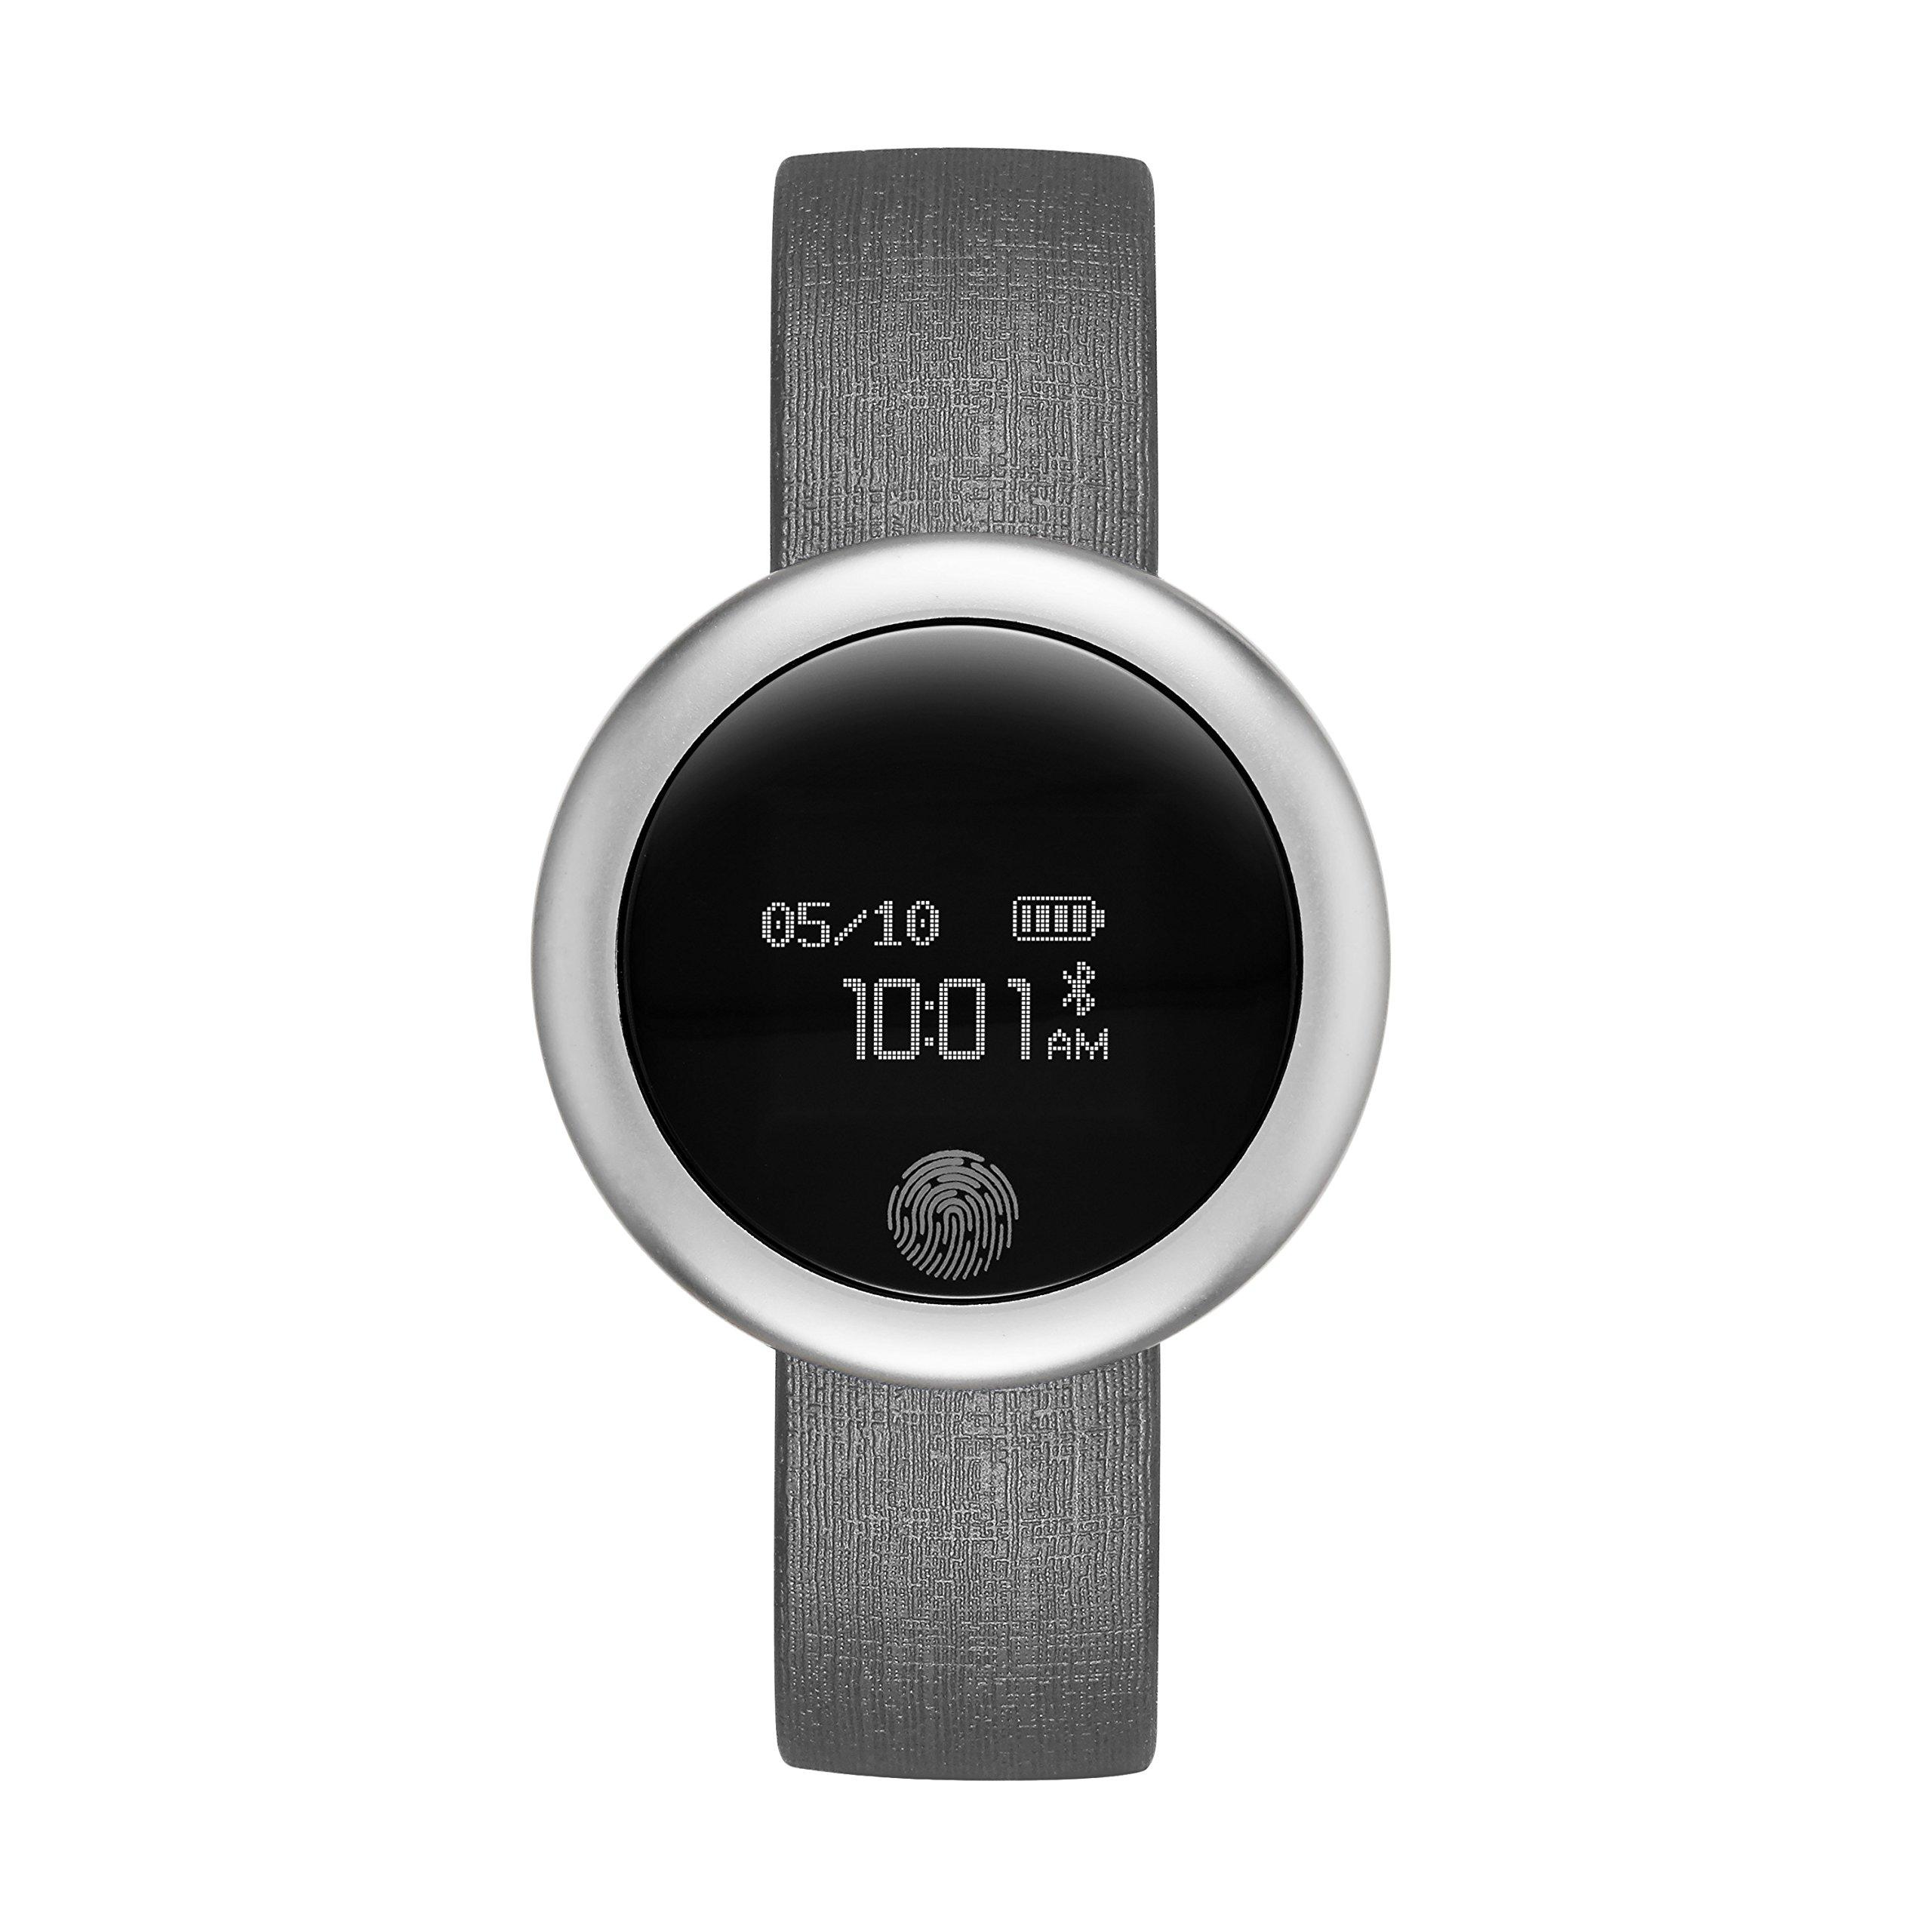 Emotion Unisex Metal and Rubber Smartwatch, Color: Silver-Tone, Grey (Model: FMDEM001)